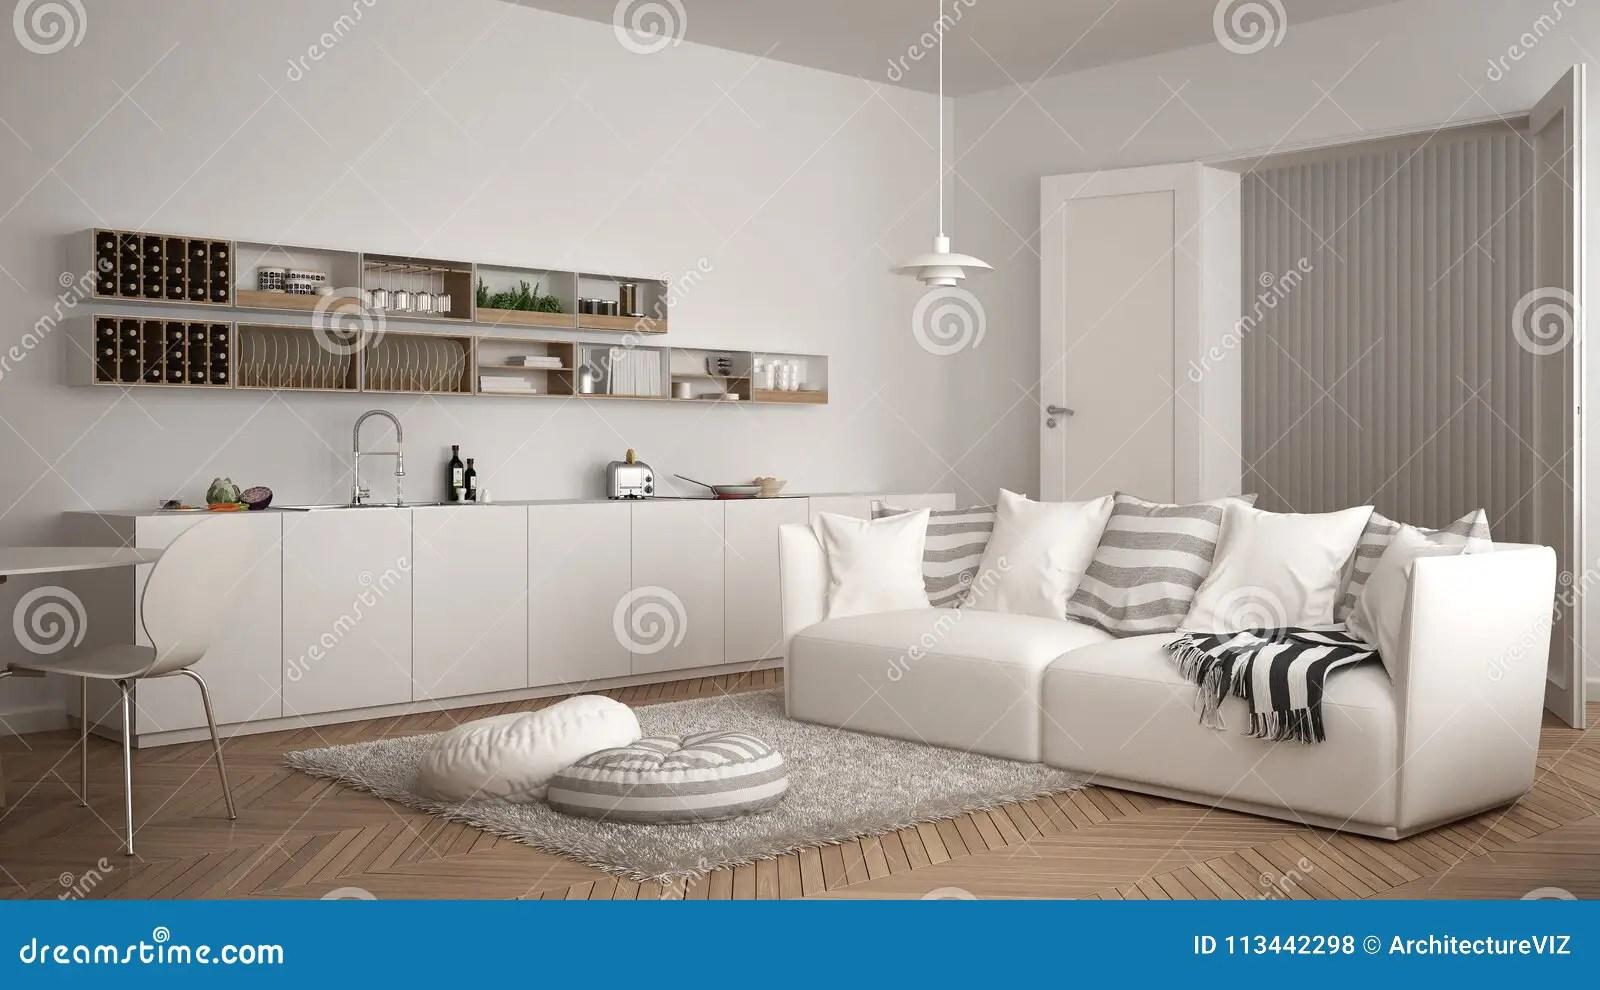 kitchen dining tables wall tile for 有厨房 餐桌 沙发和地毯的与枕头 最低纲领派白色建筑学内部desi斯堪的 最低纲领派白色